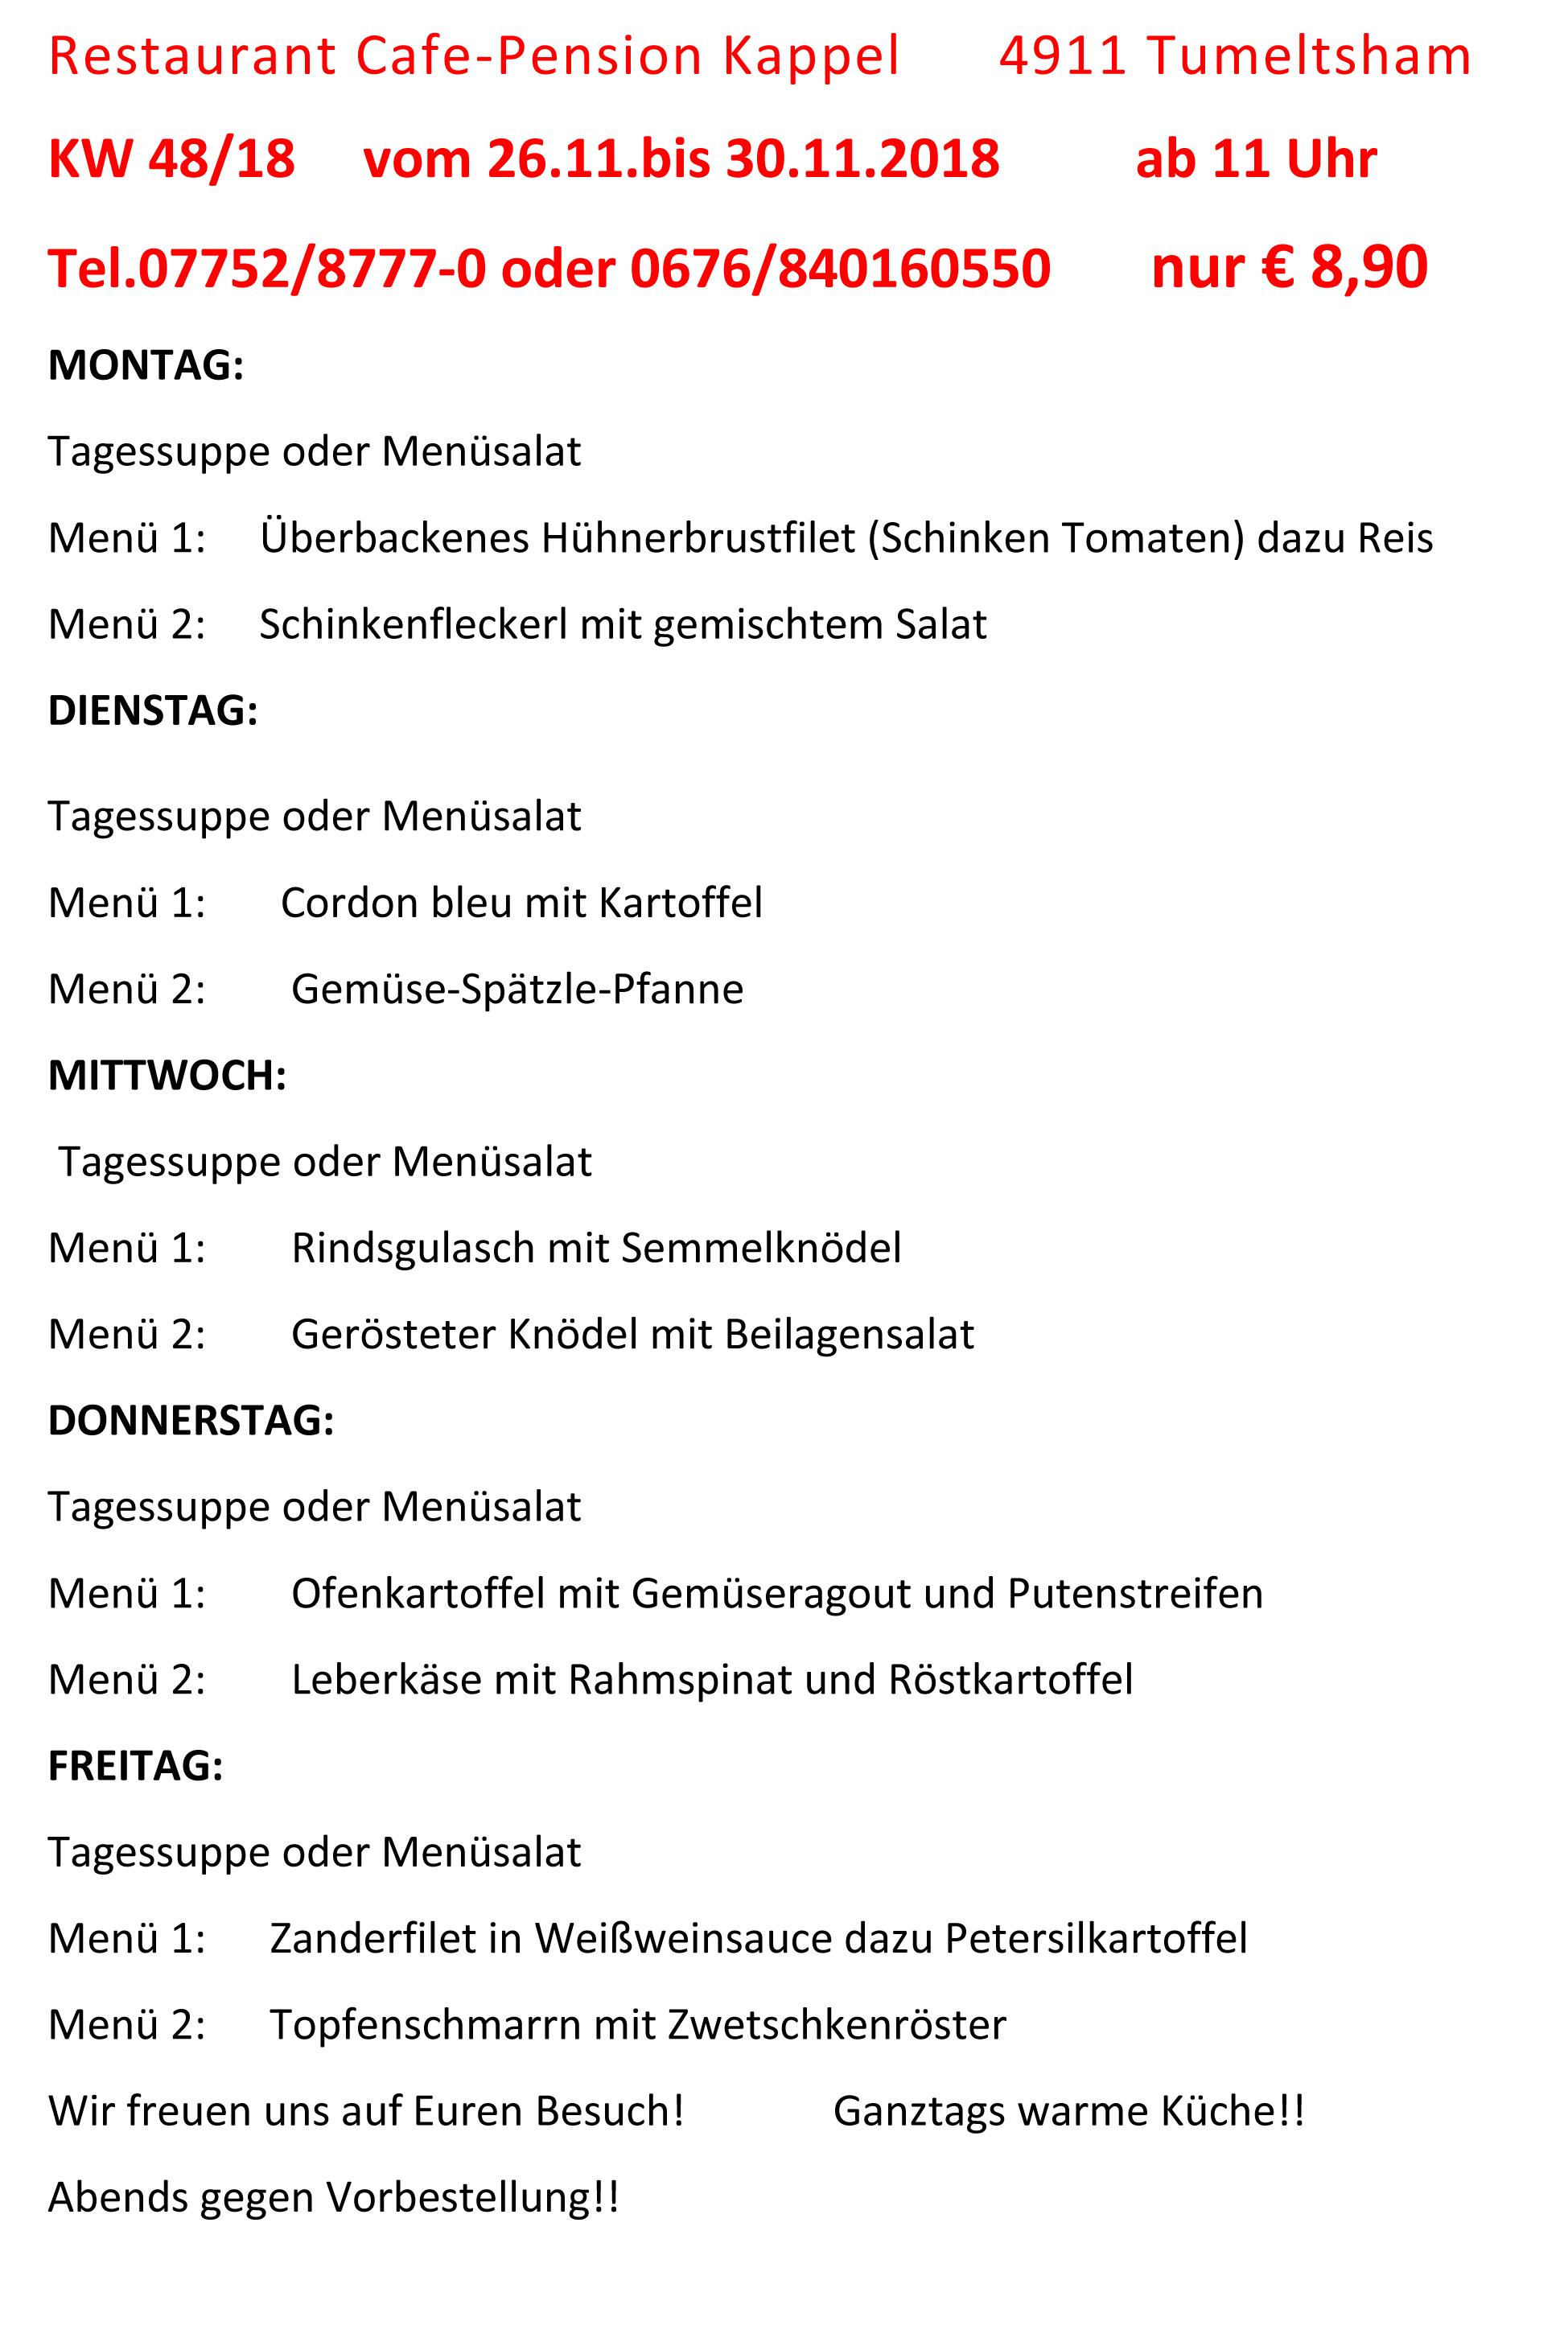 Menüplan KW 48-18 (1)